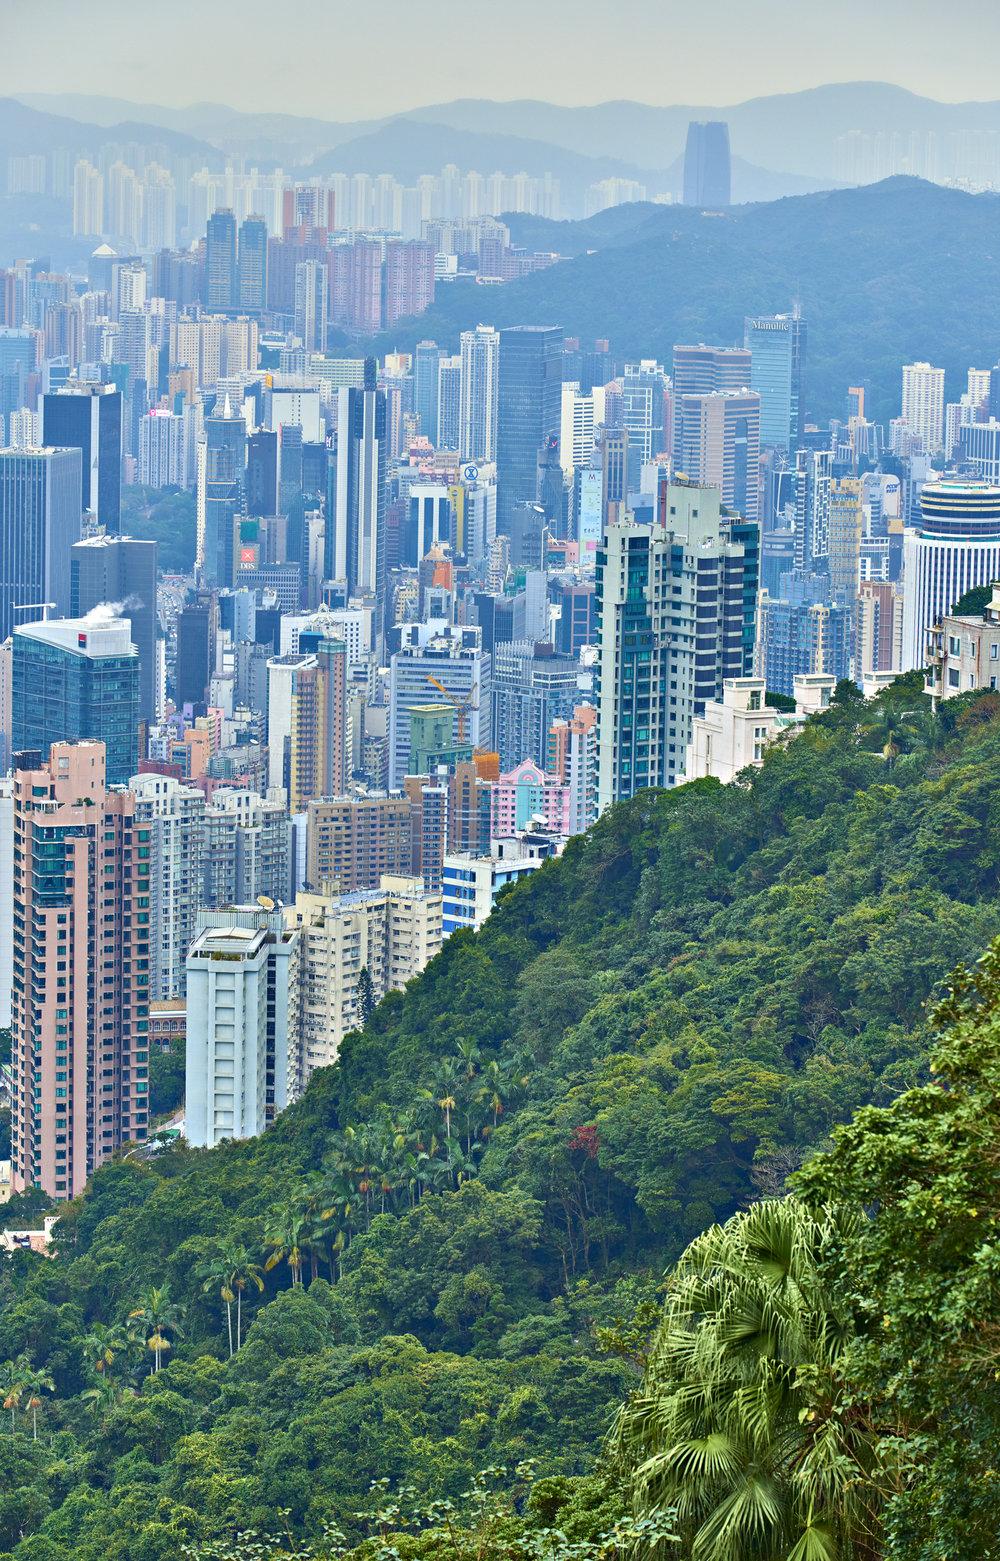 Rosewood Hong Kong 2016 0247.jpg